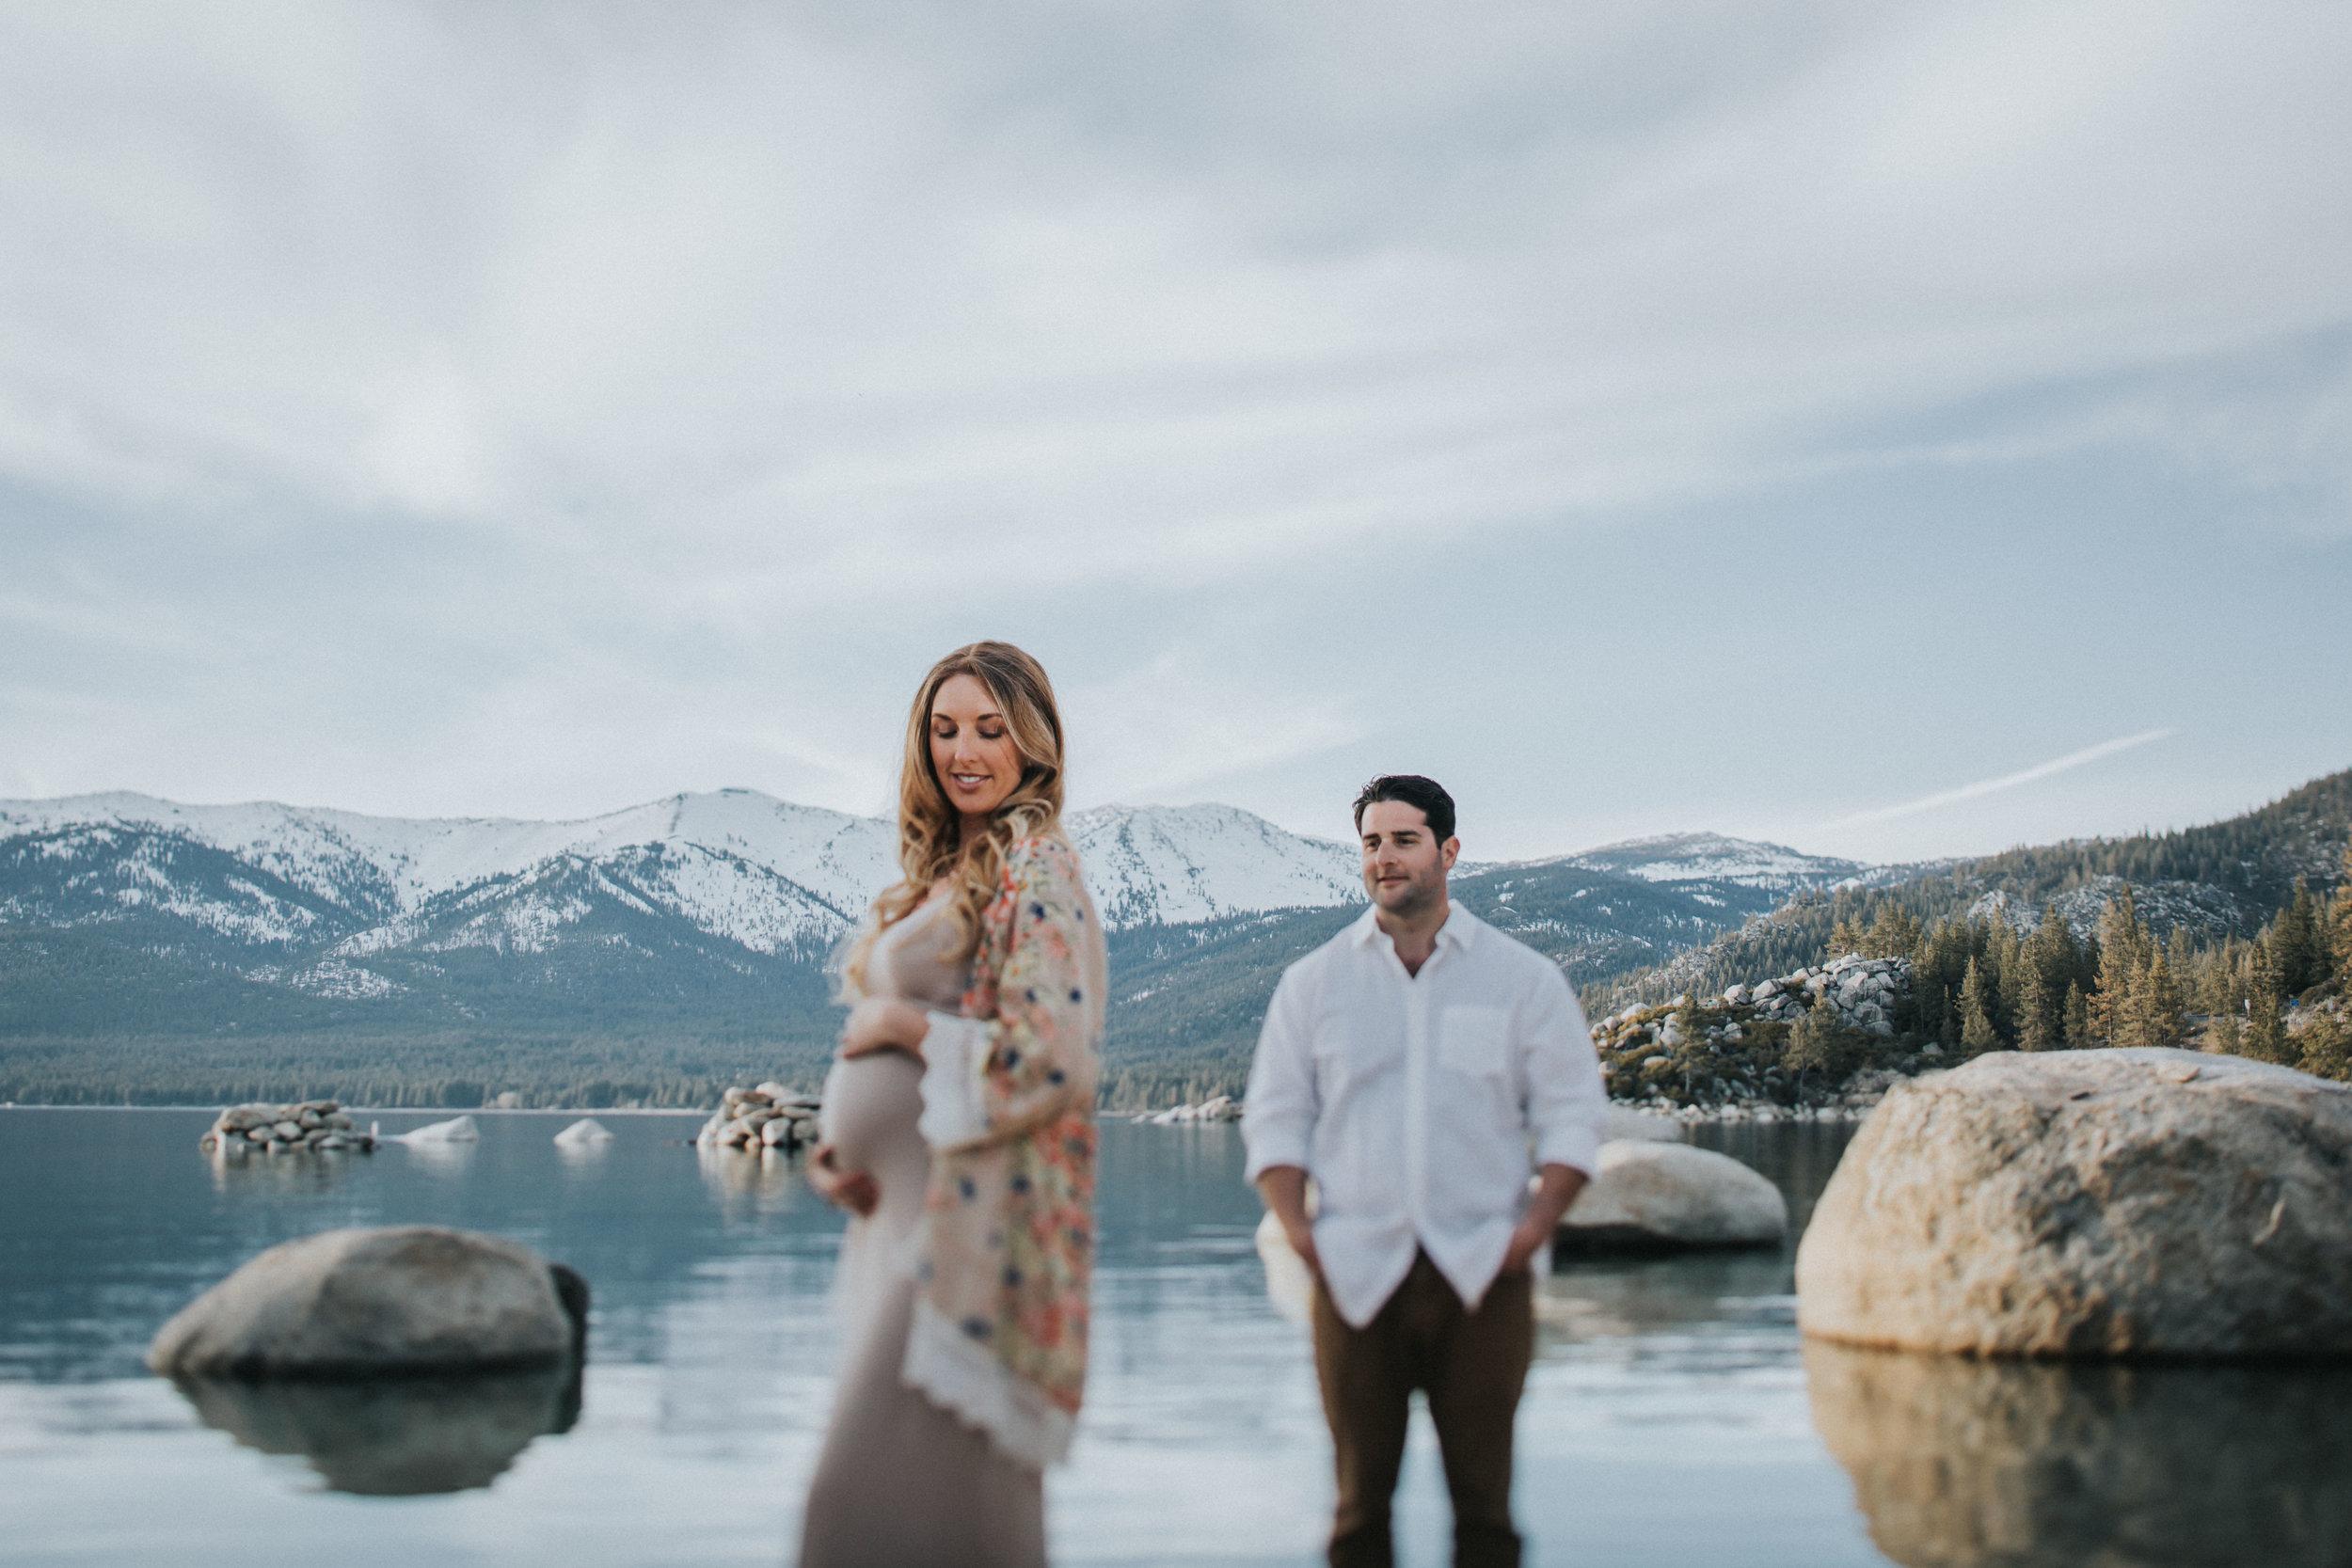 Lake_Tahoe_Maternity_Session_Krissy_Doug-96.jpg